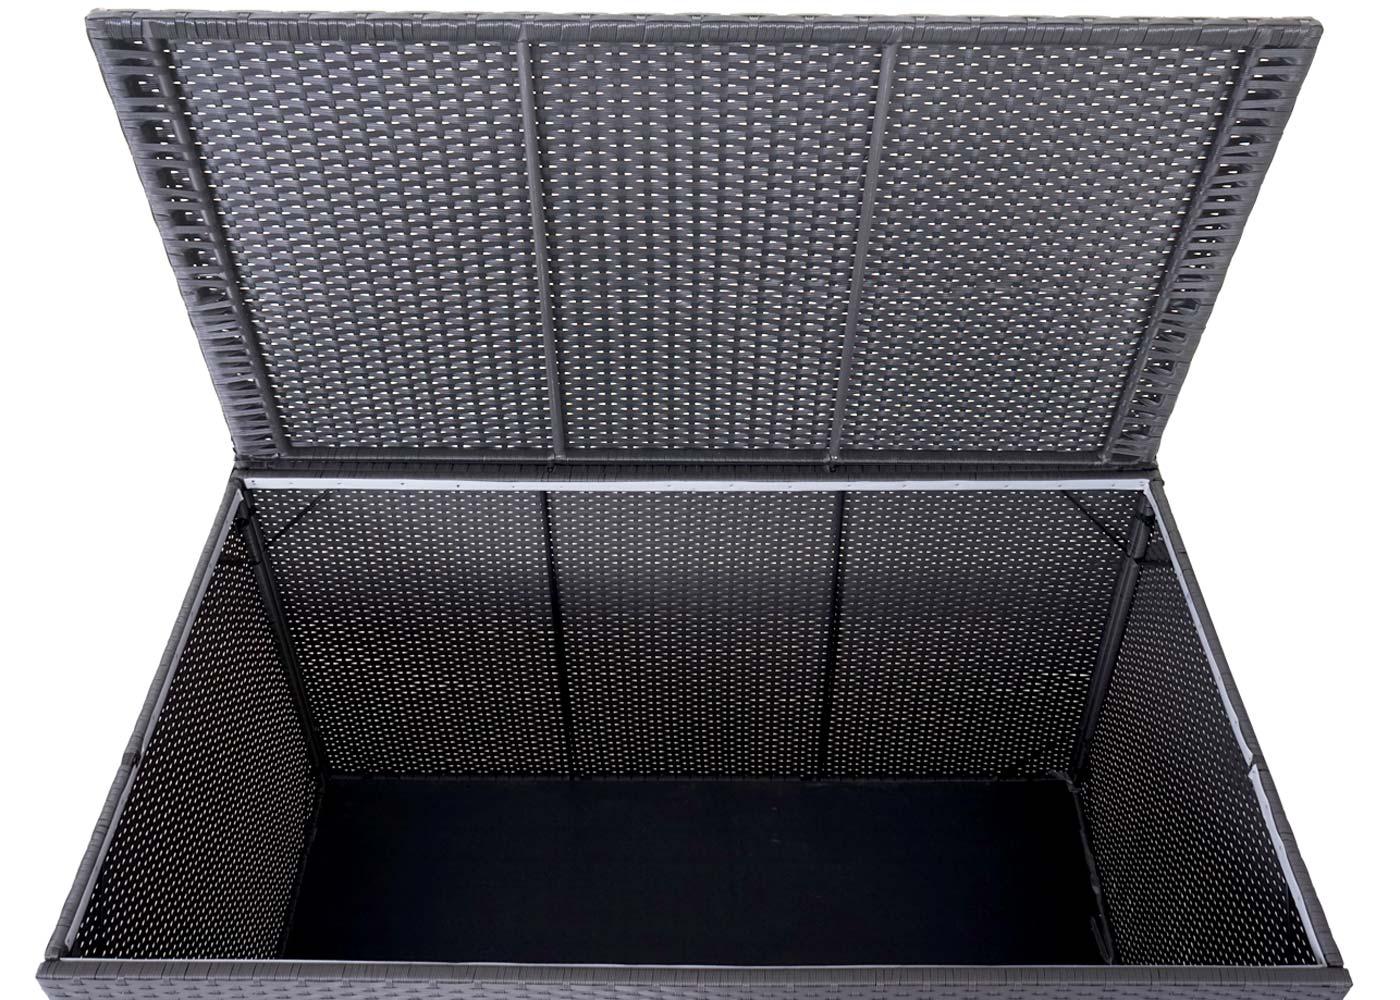 Fabulous XXL Rattan Kissenbox Barry 920l Auflagenbox Gartenbox ~ grau - jamb.ch IB62